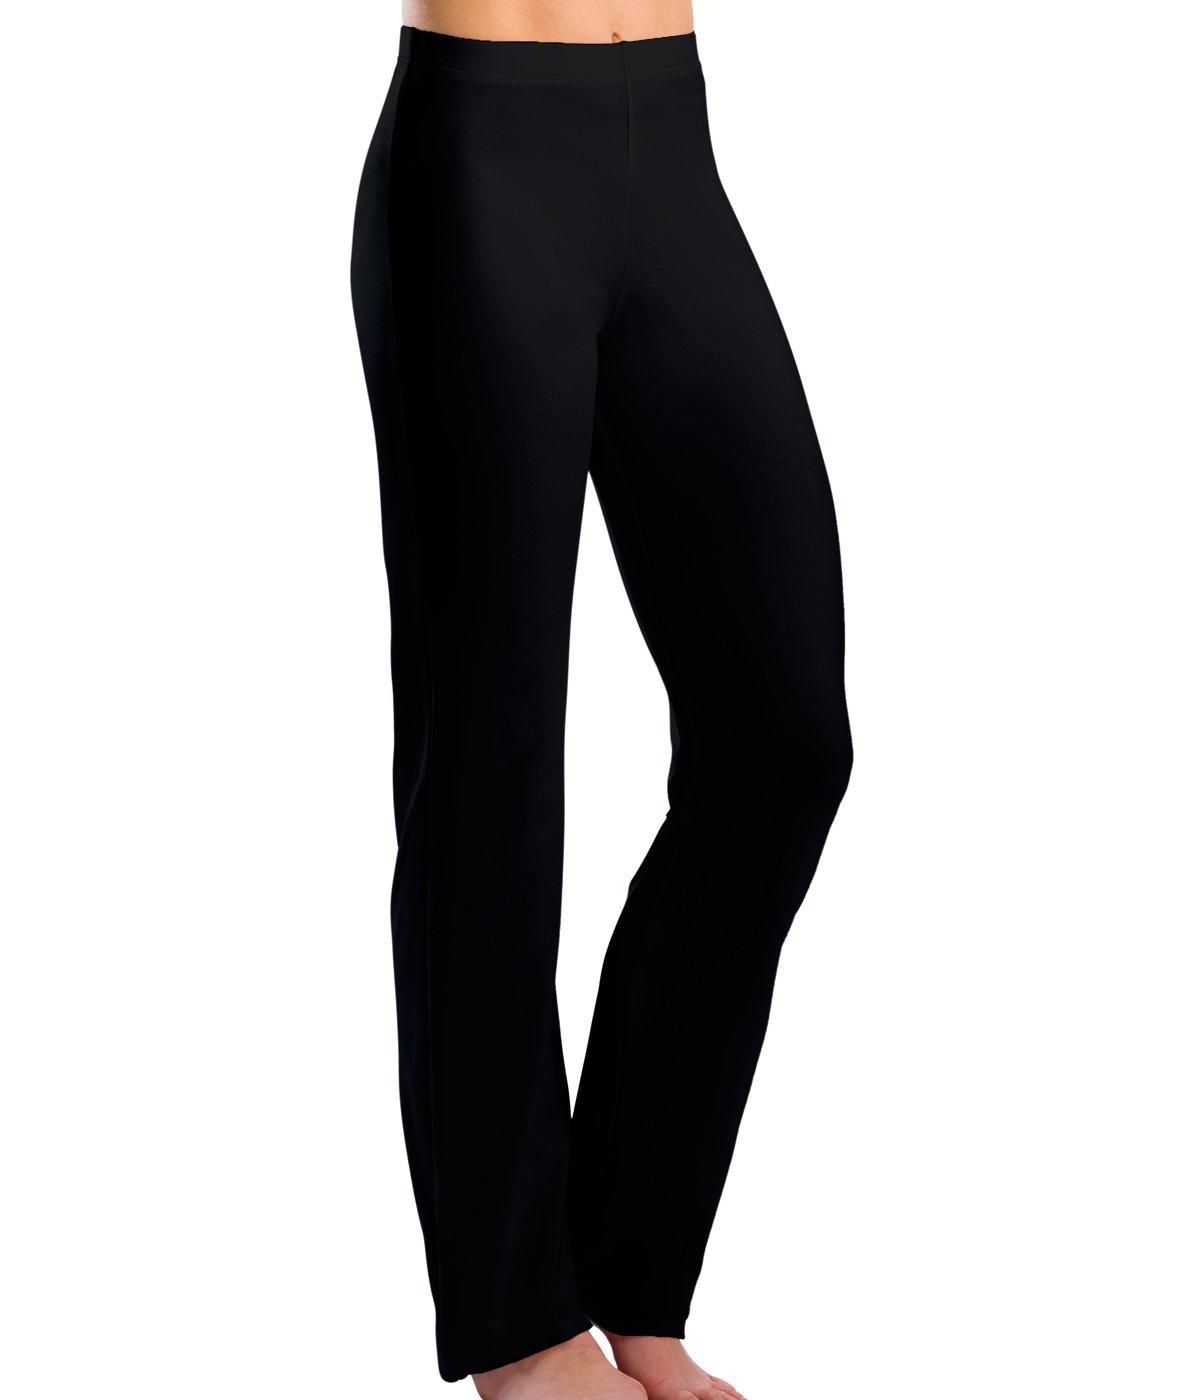 Motionwear Girl's Boot Cut Jazz Pants L BLACK